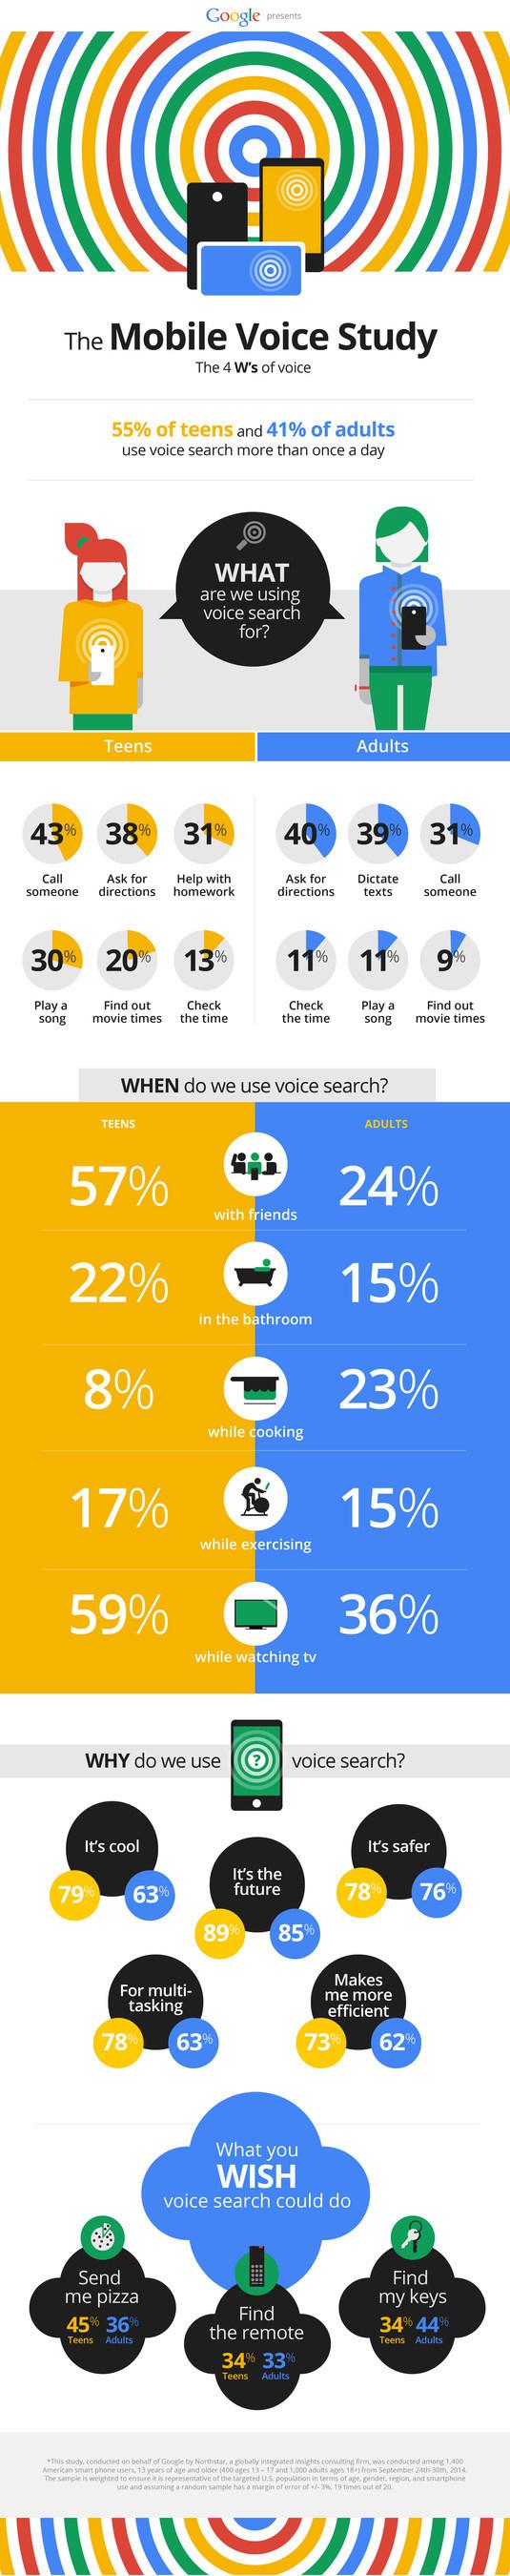 Google Mobile Voice Study Infographic (PRNewsFoto/Google Inc.)